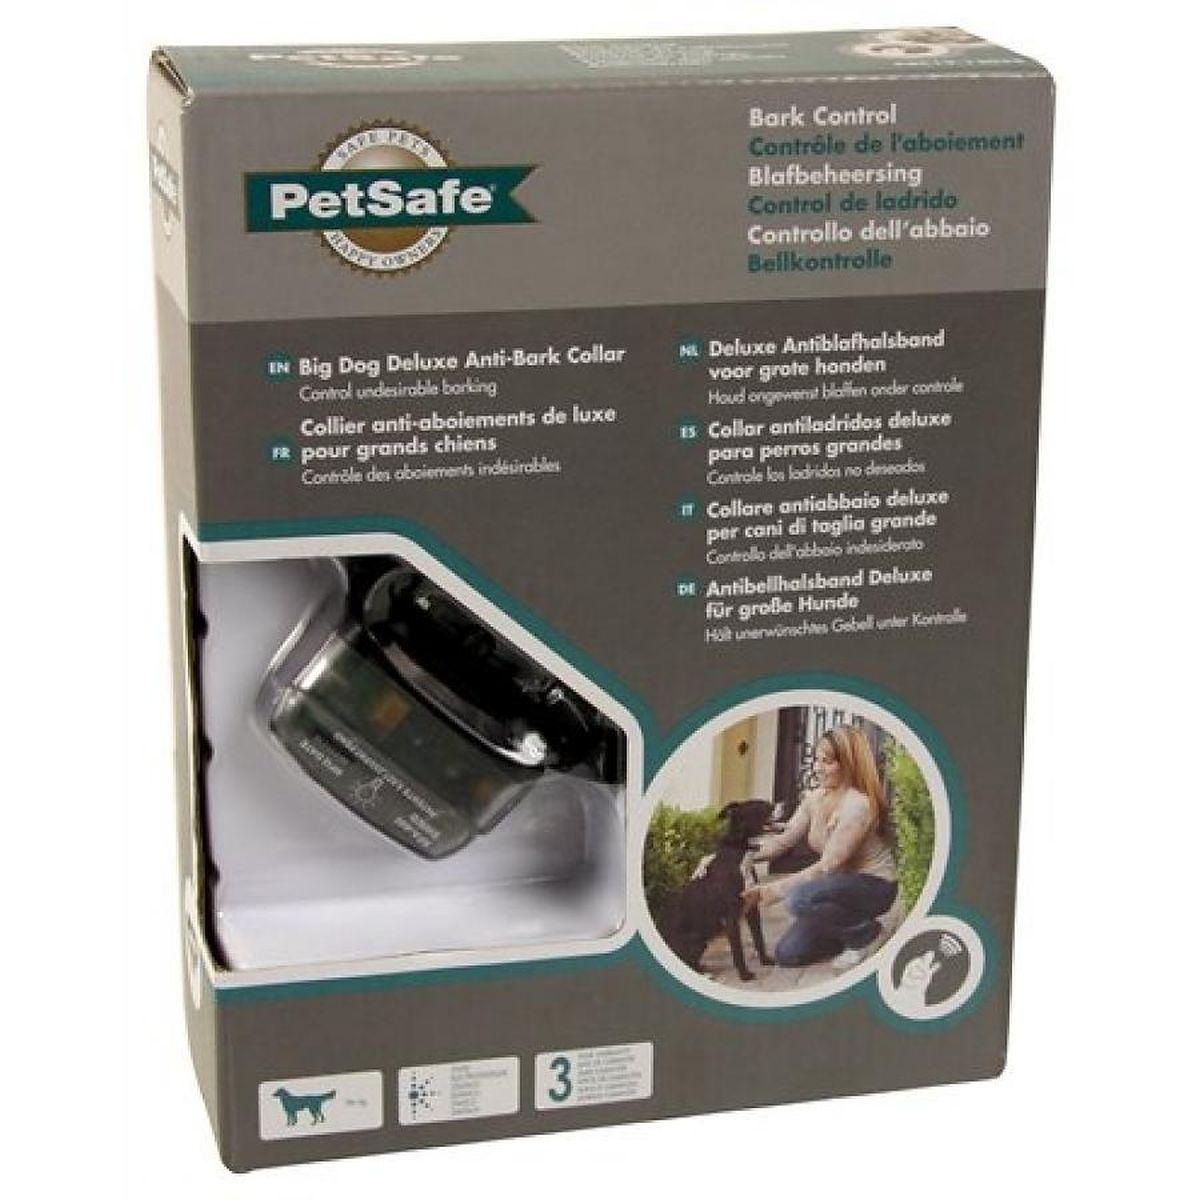 Anti blafband Petsafe 6016 deluxe grote hond vanaf 18kg